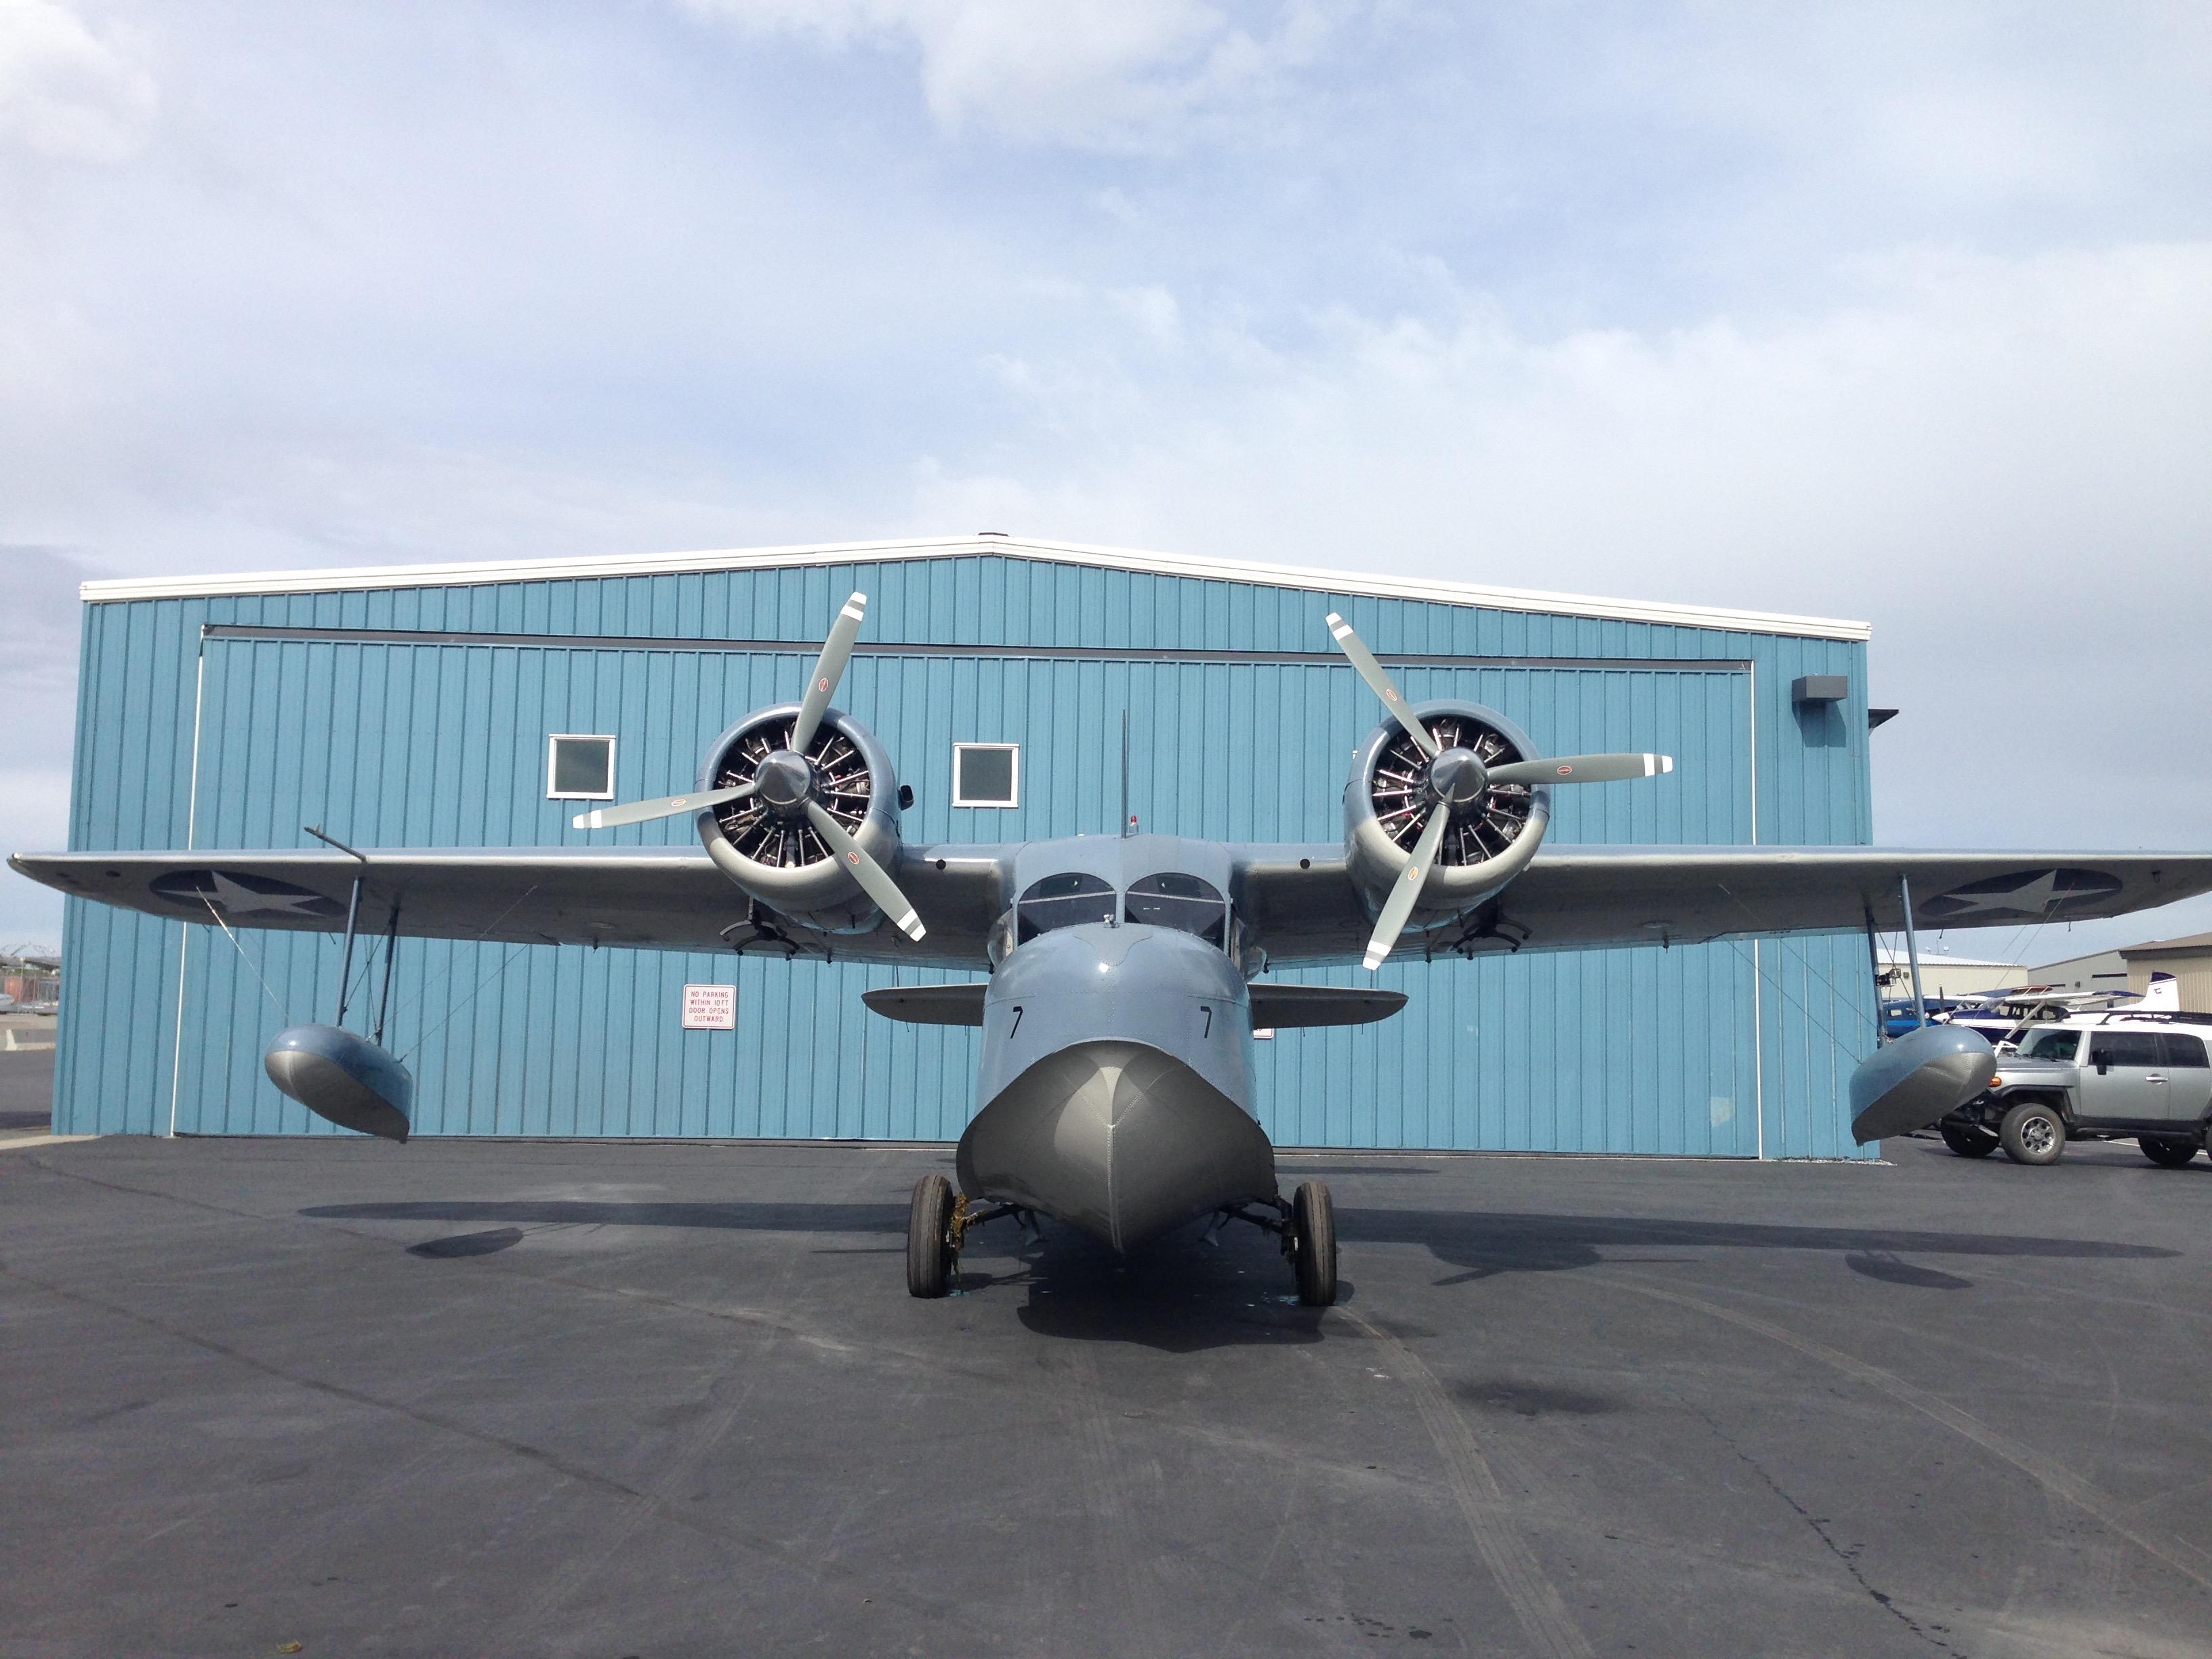 The Goose Hangar